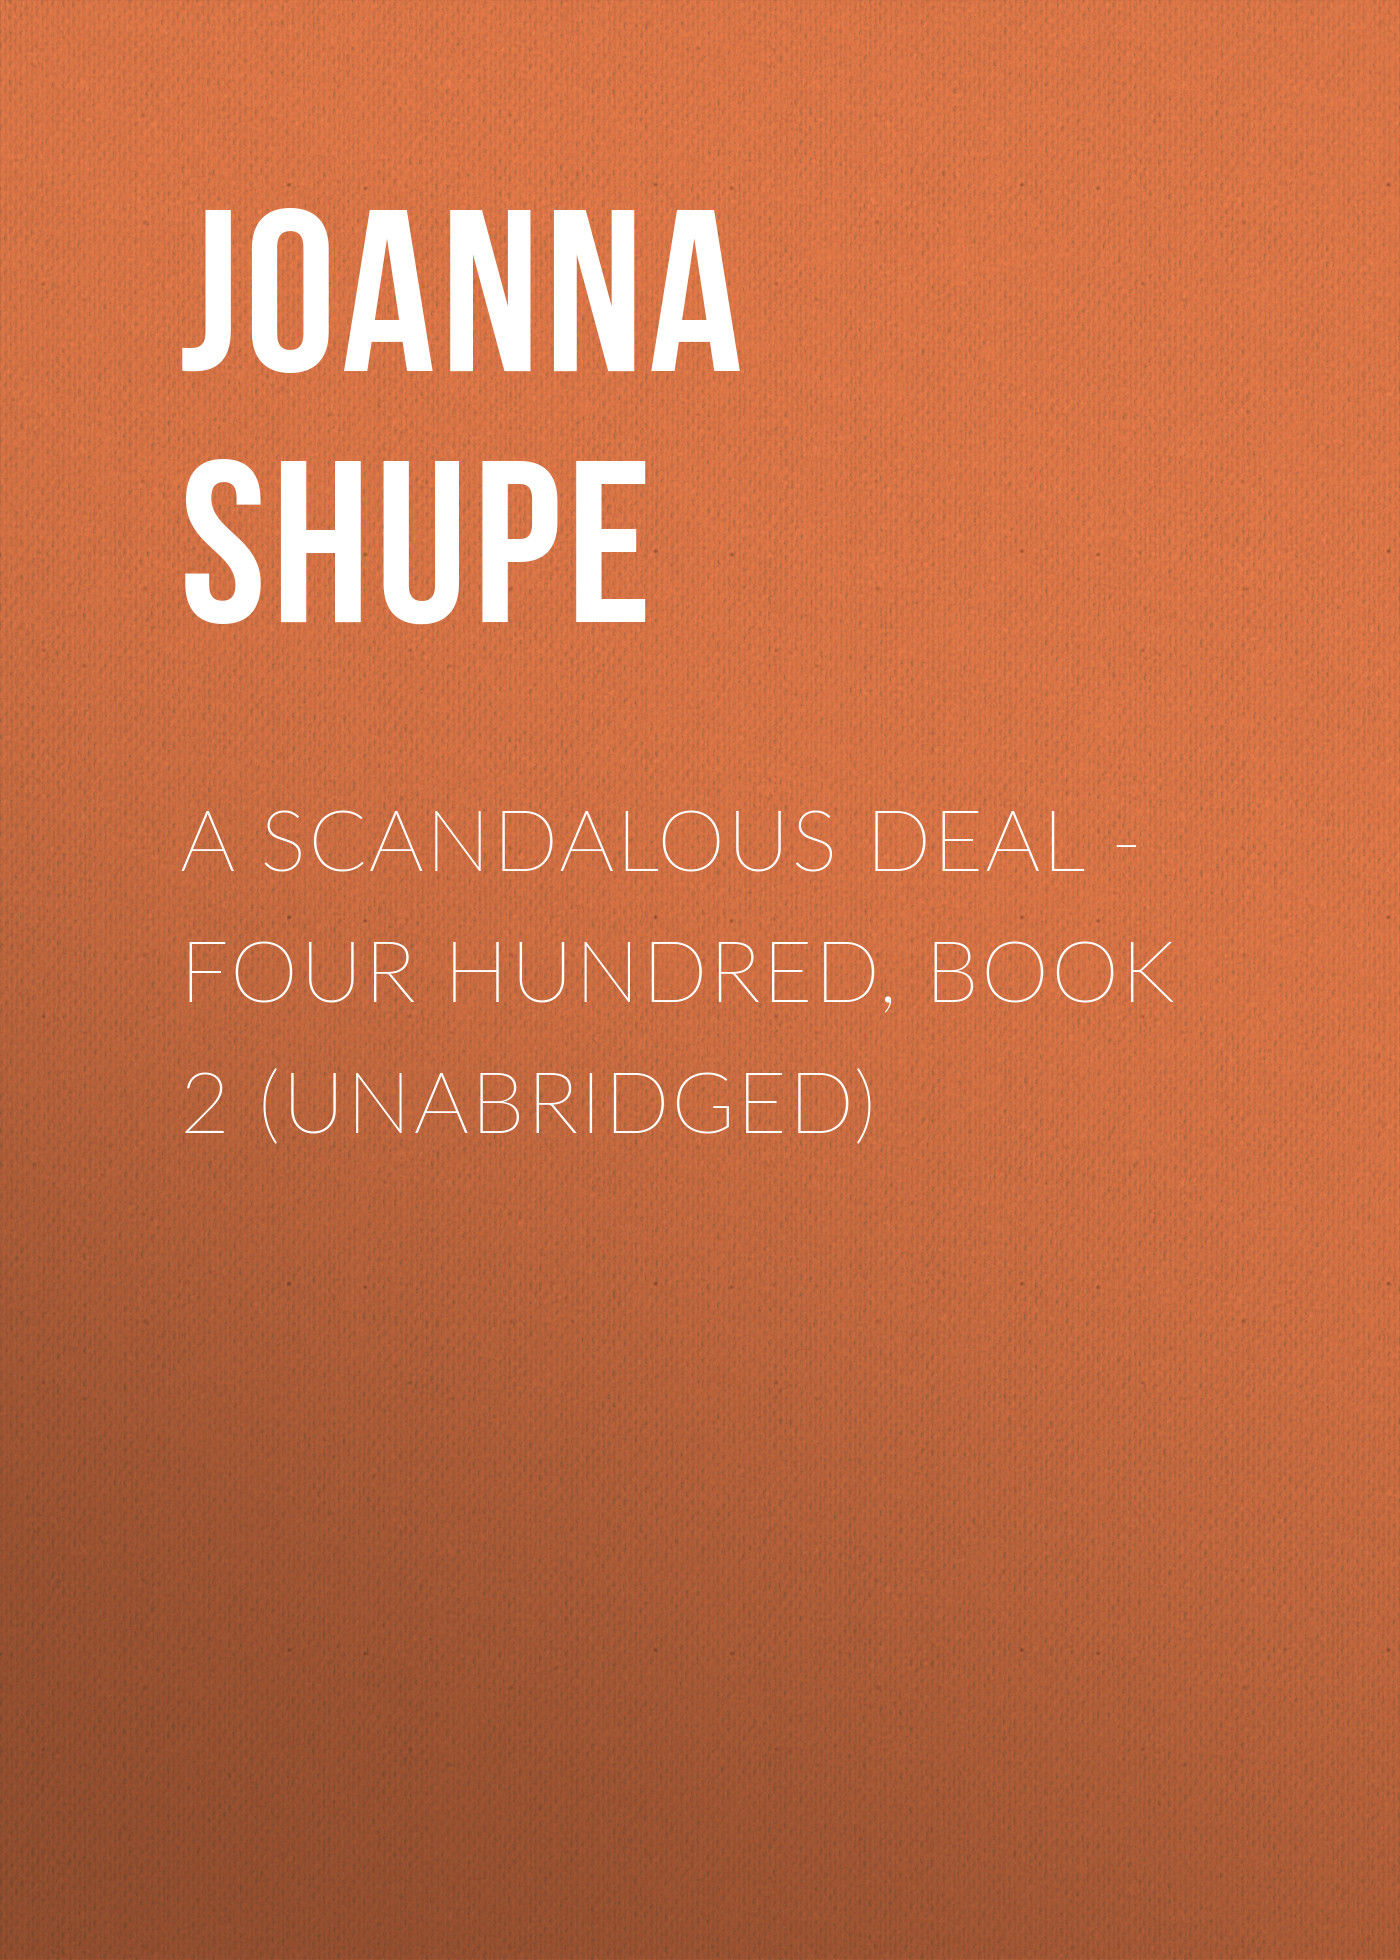 Joanna Shupe A Scandalous Deal - Four Hundred, Book 2 (Unabridged) scandalous mackenzies